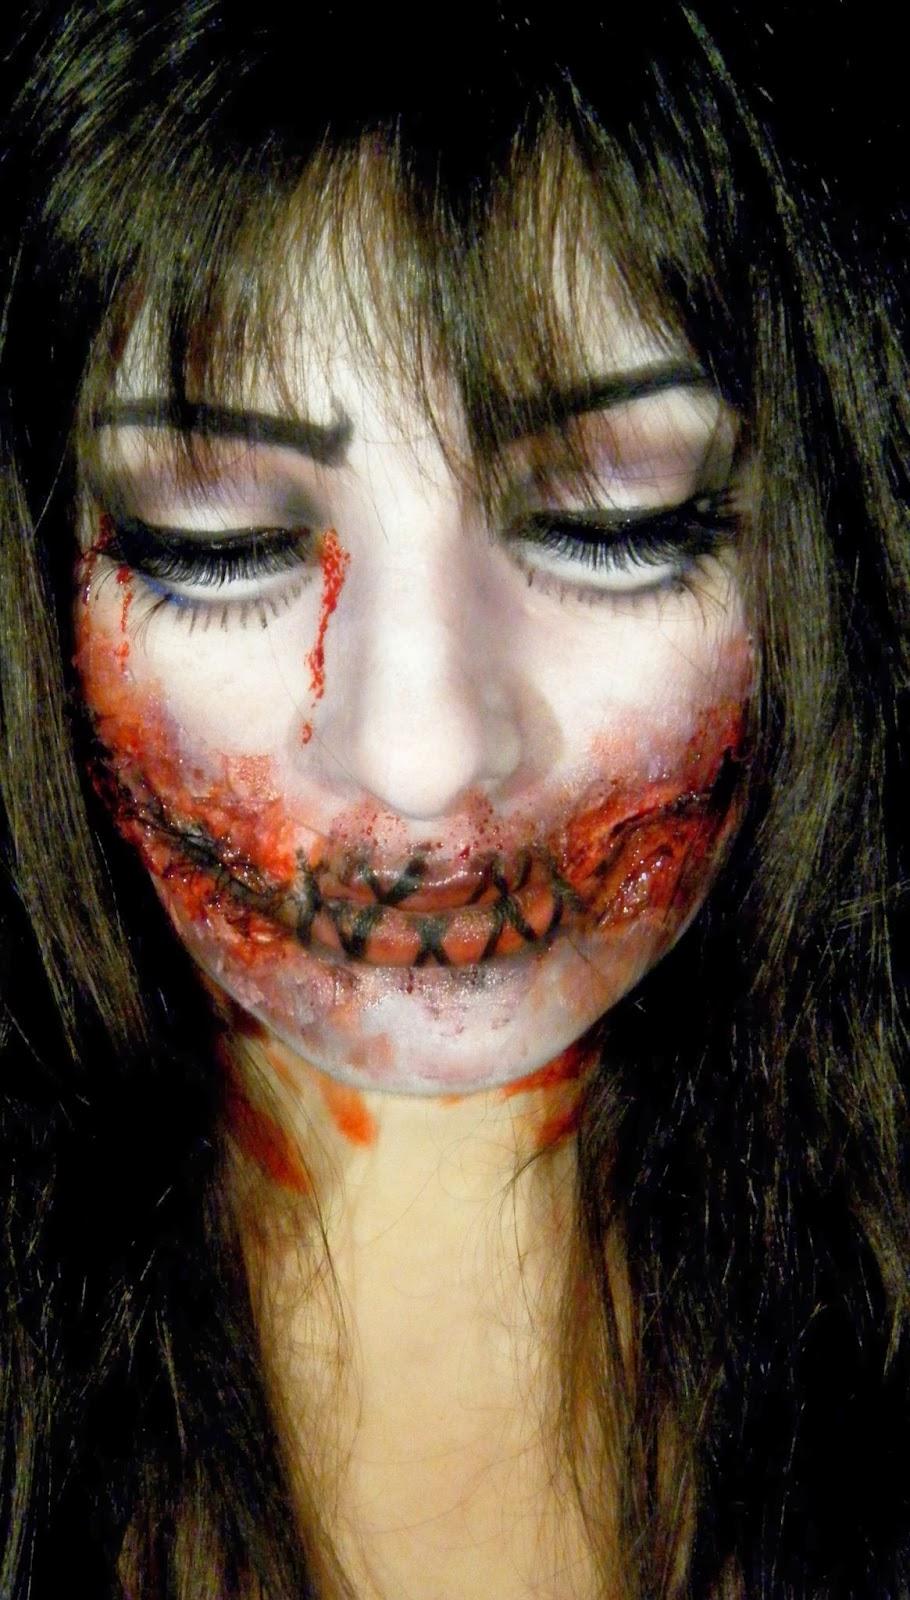 Mon petit coin beaut maquillage halloween 3 creepy doll - Maquillage halloween cicatrice ...